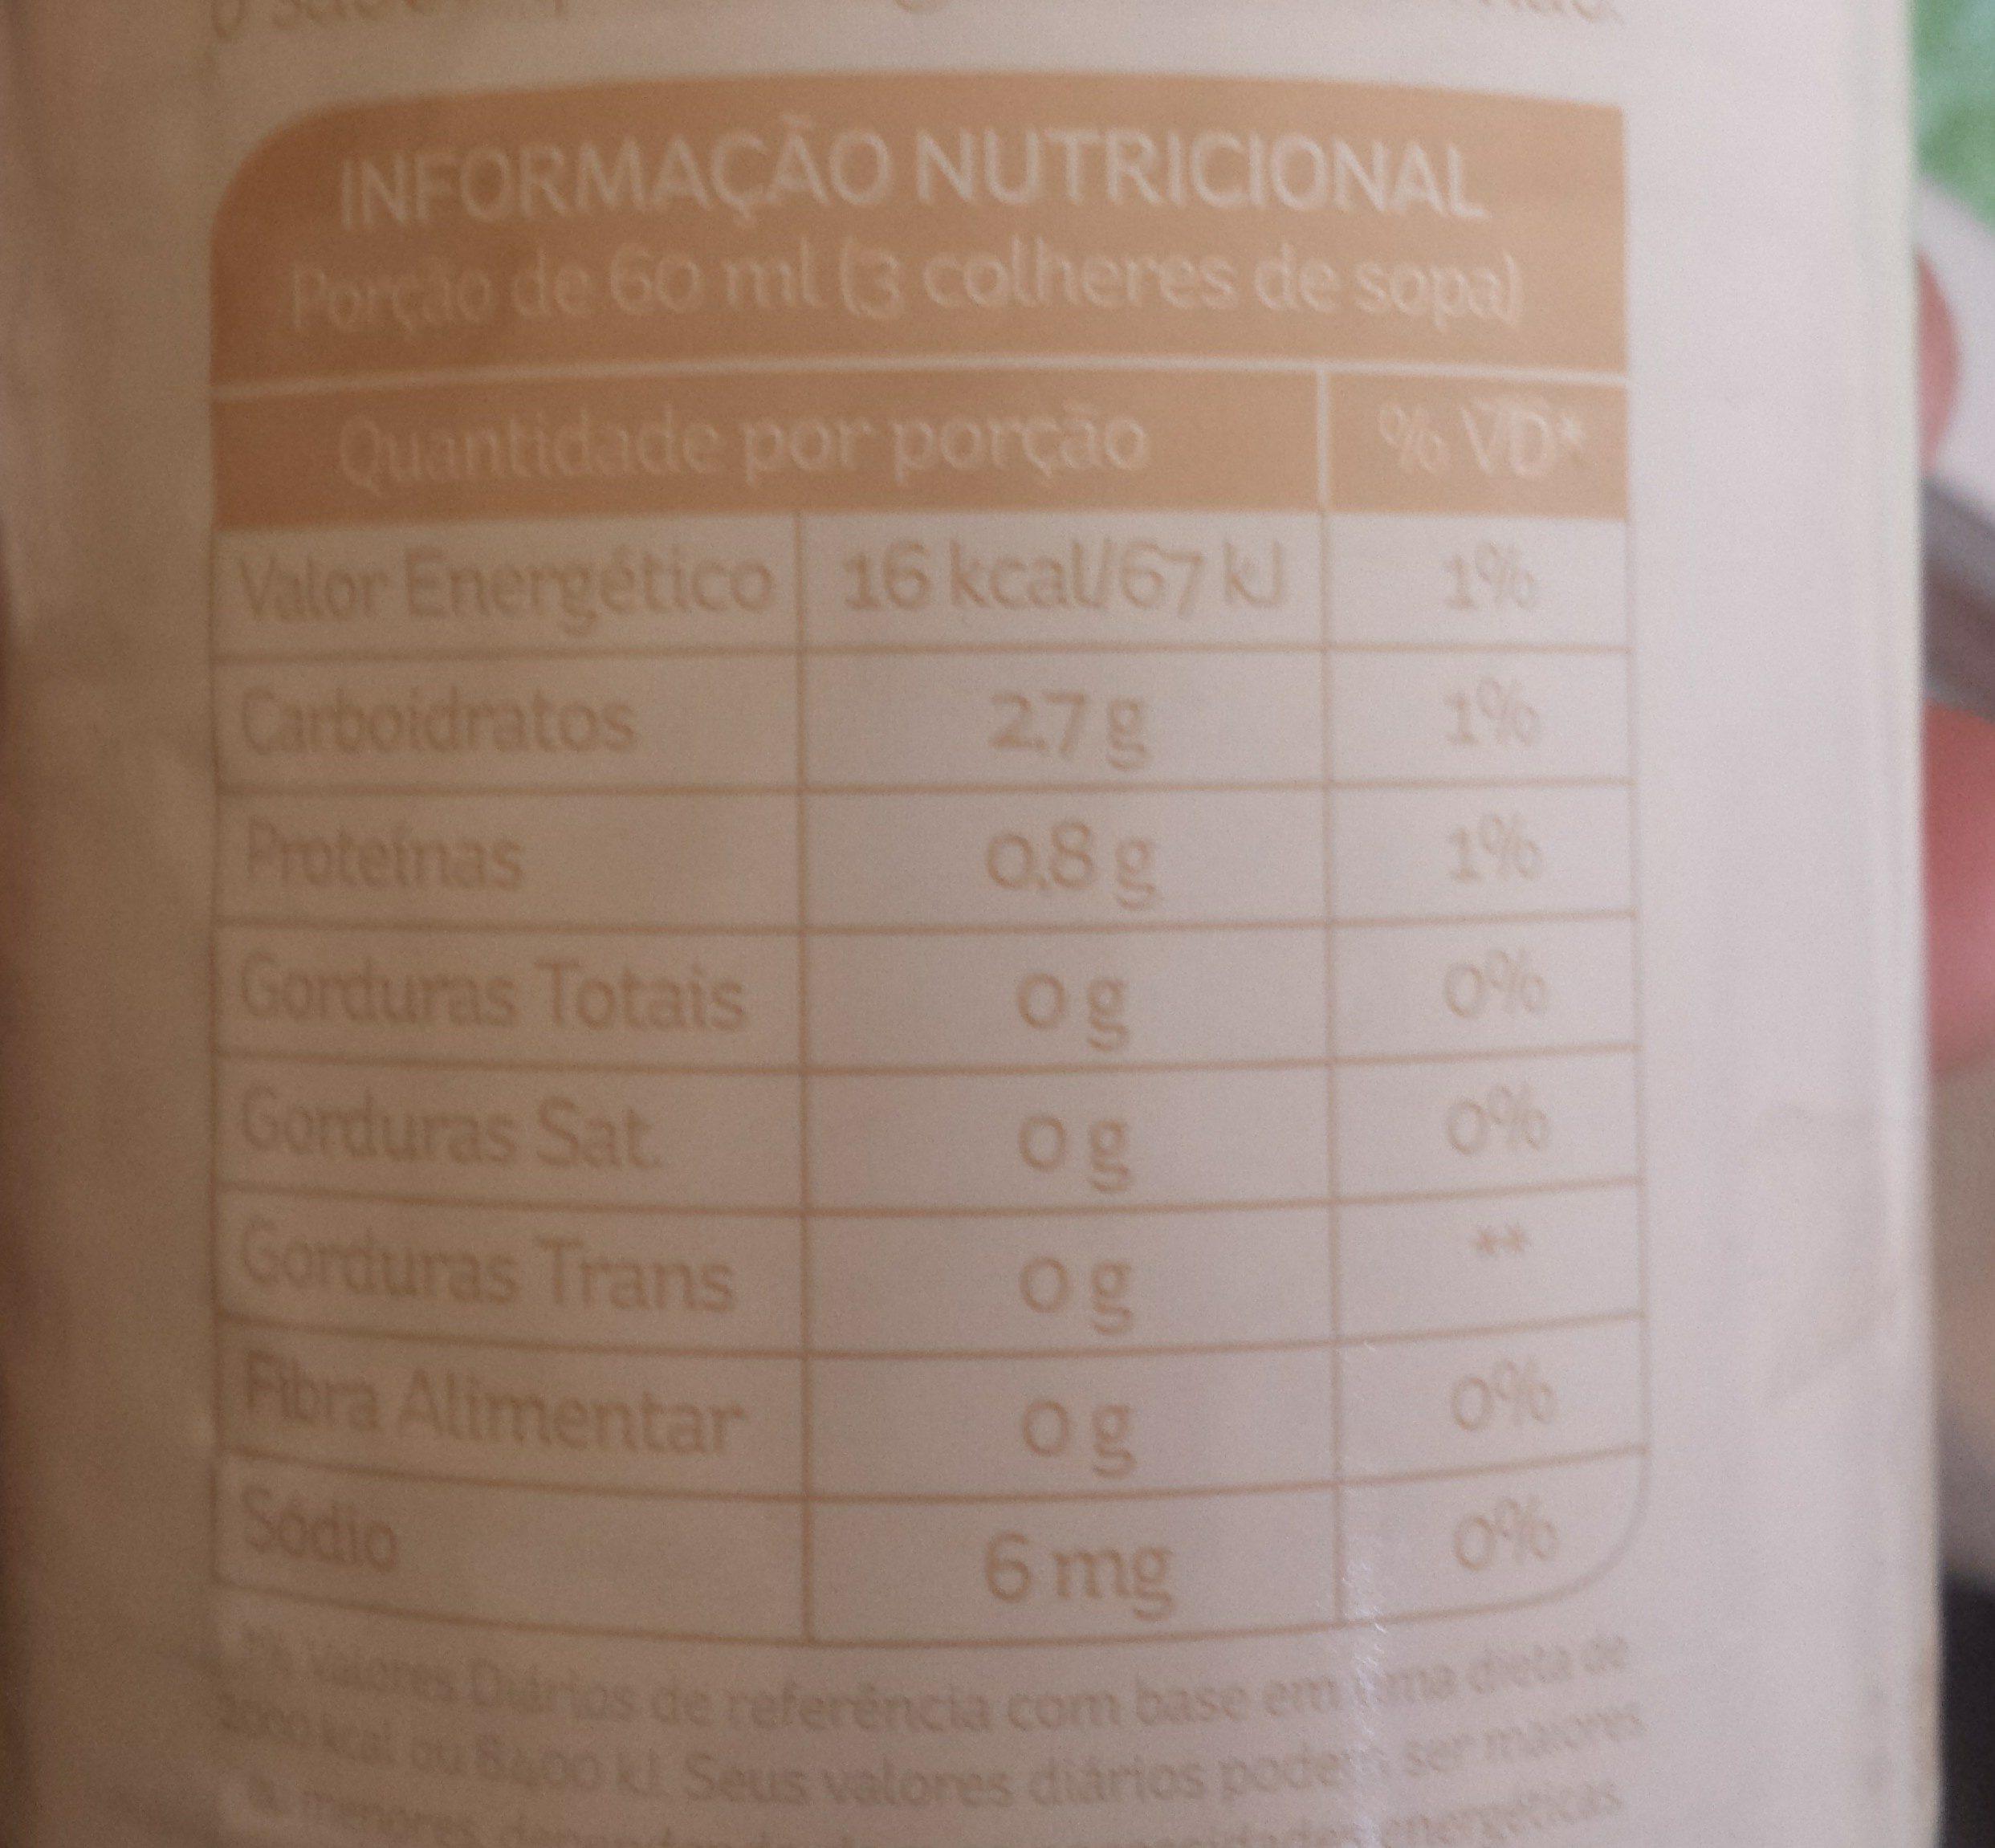 Tomate sem pele - Nutrition facts